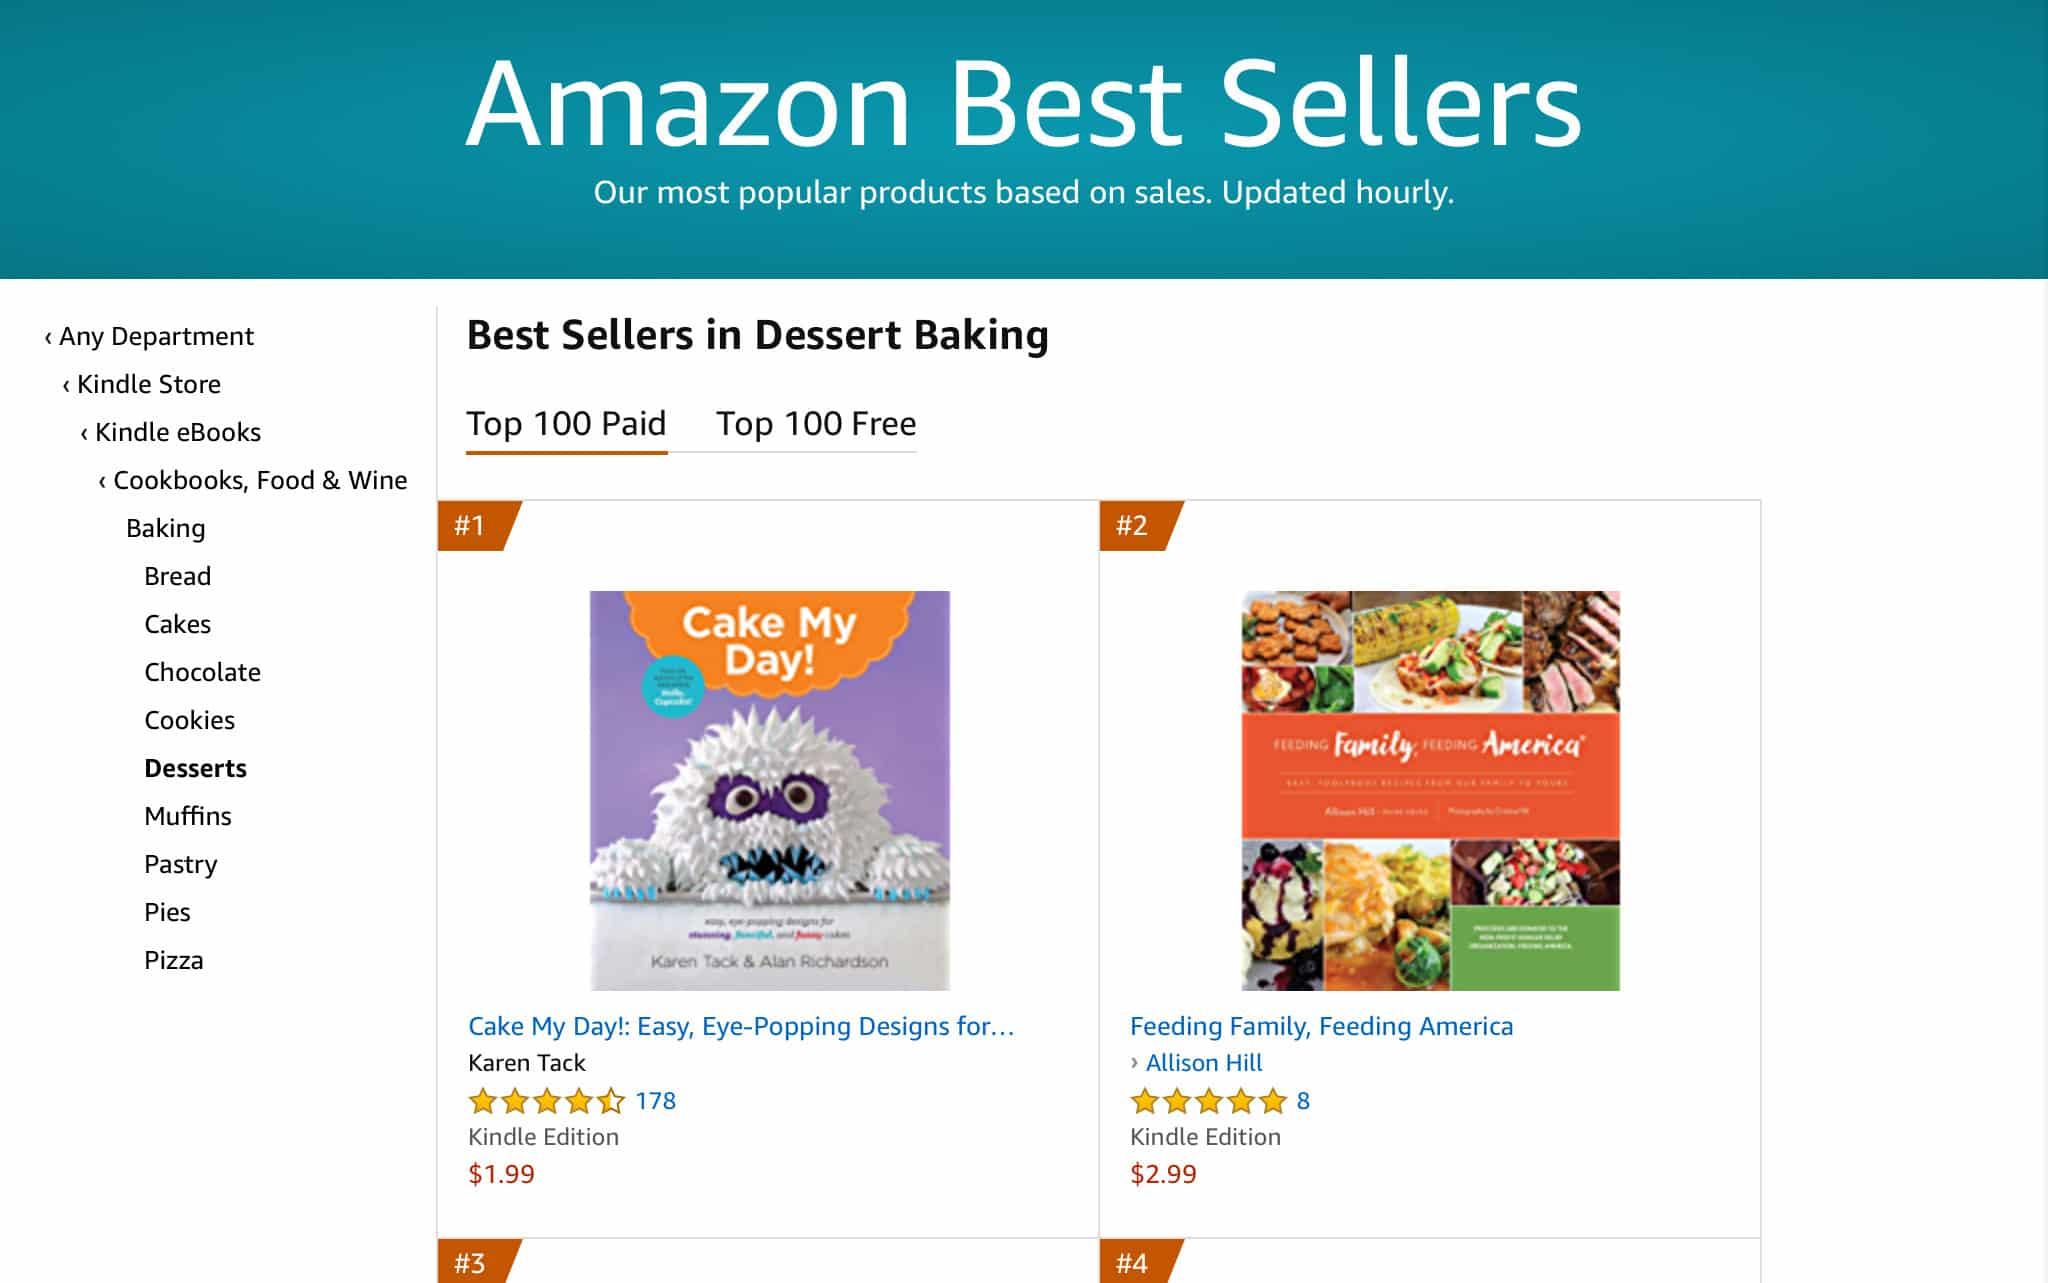 Feeding Family Feeding America Amazon Best Seller by allison hill 4   Mindstir Media Book Cover